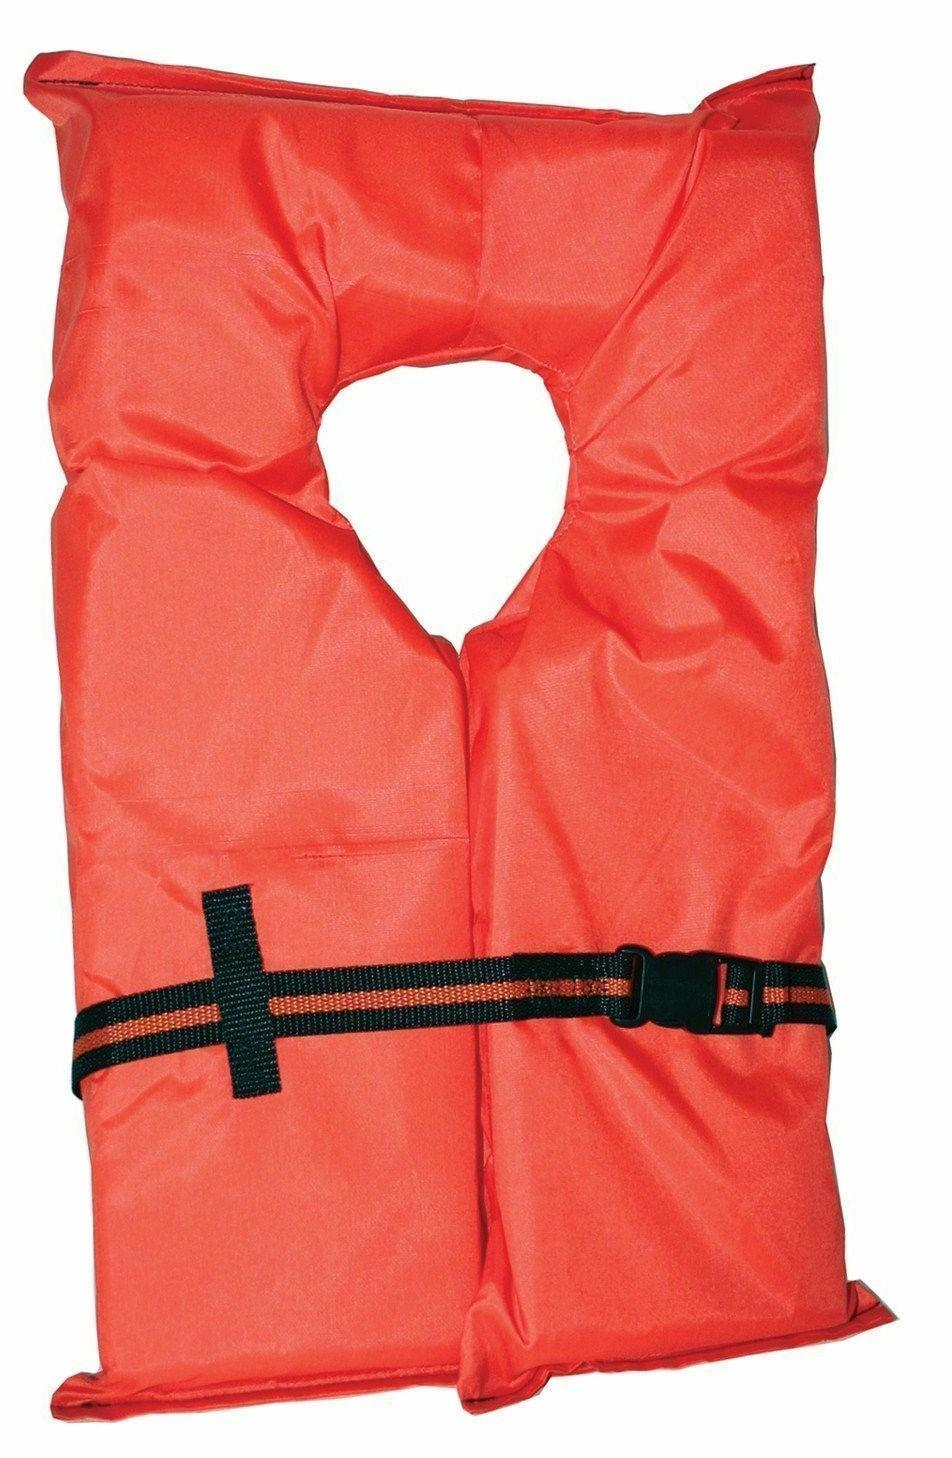 6 Pack Life Vest Preserver Type Orange Adult USCG PFD